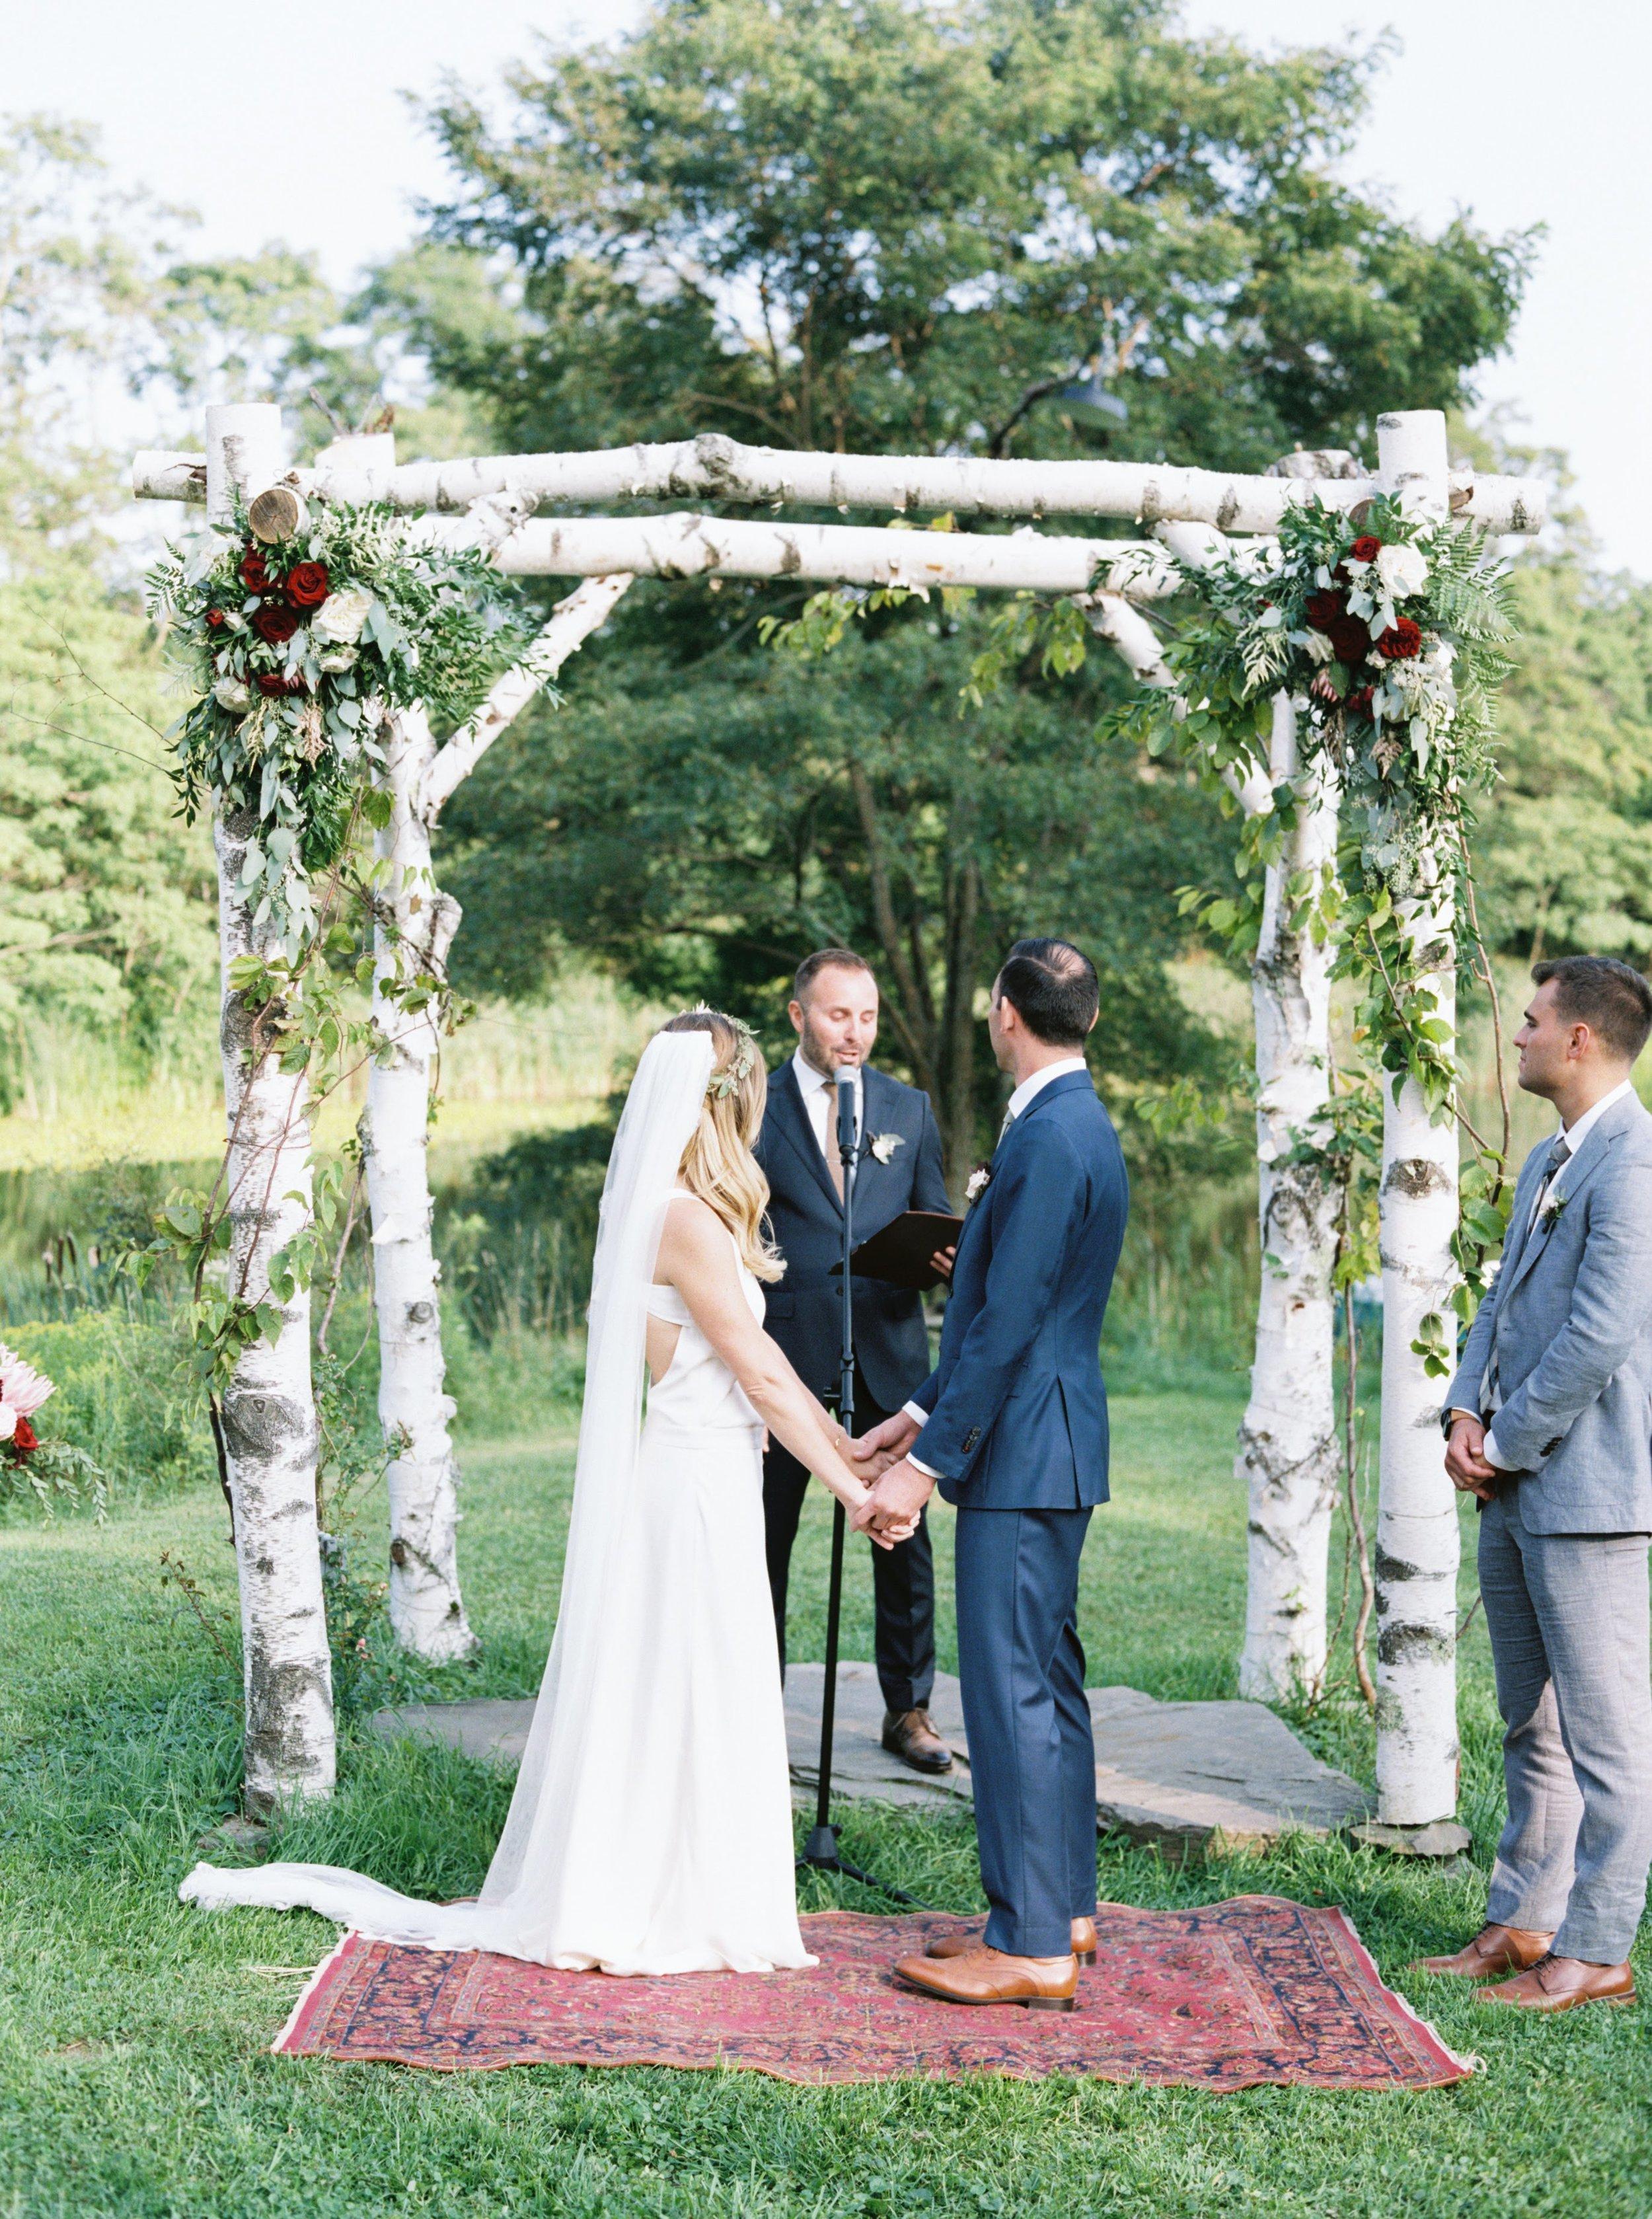 Courtney + Matt Blenheim Hill Farm Catskills NY Wedding Veronica Lola Photography 2017-400.jpg